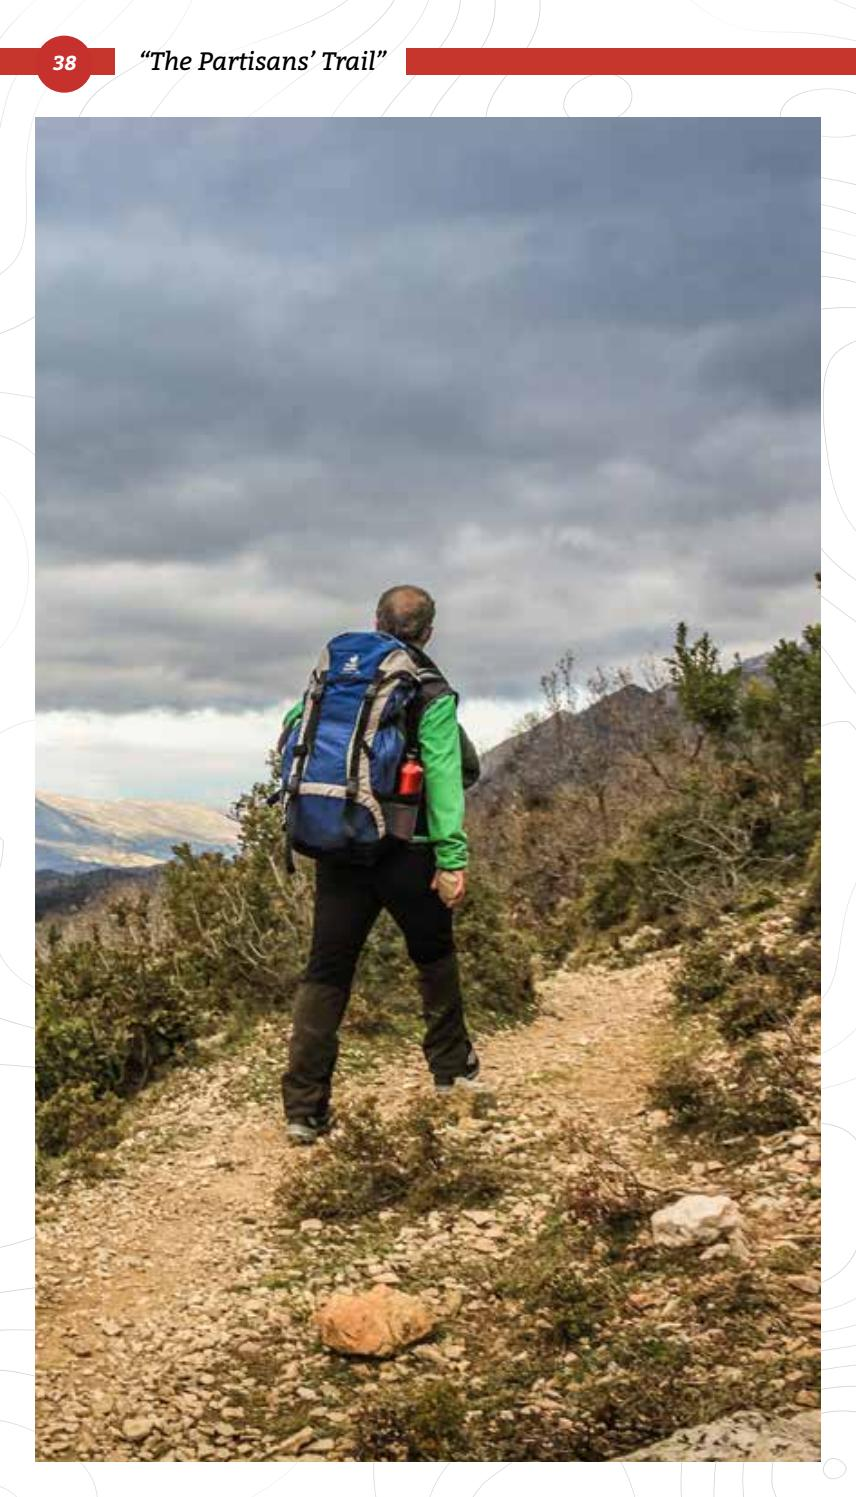 Hiking Trails in Himara Region page 38